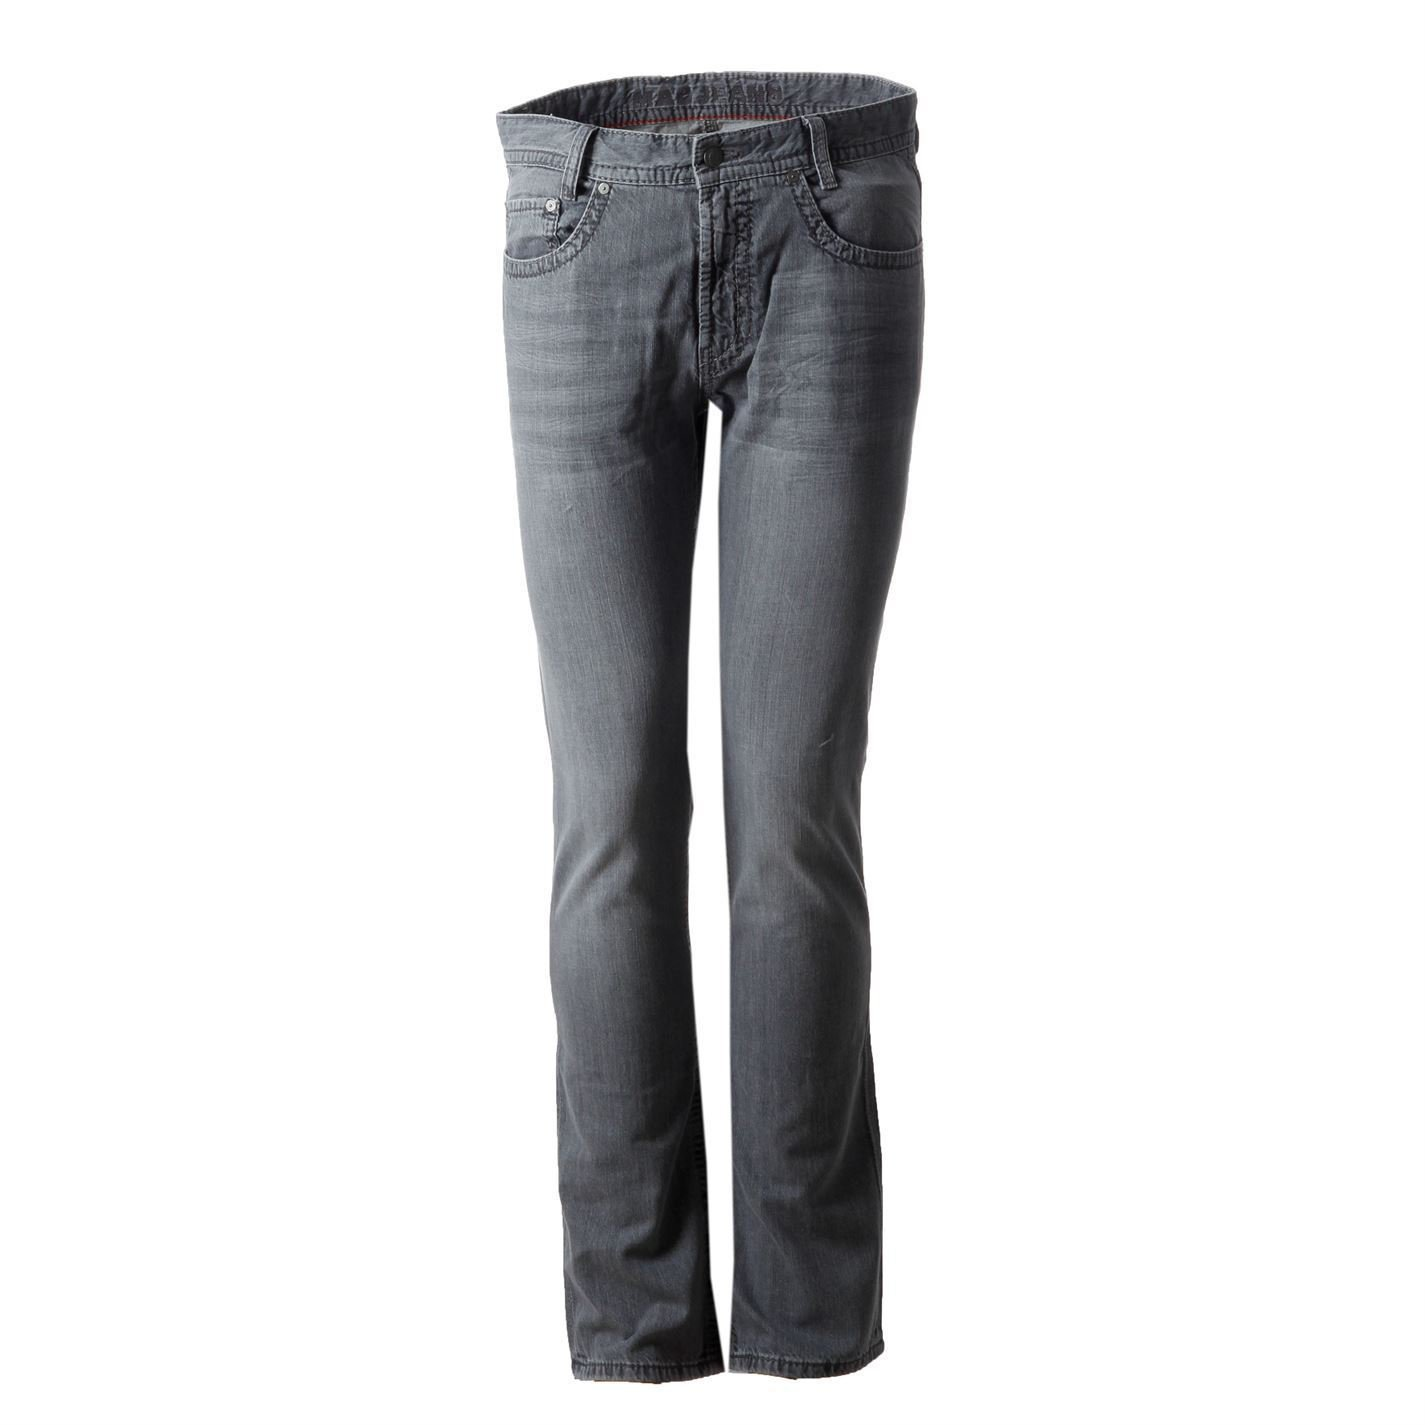 Mac Mens Arne Jeans Casual Everyday Denim Pants Trousers Bottoms